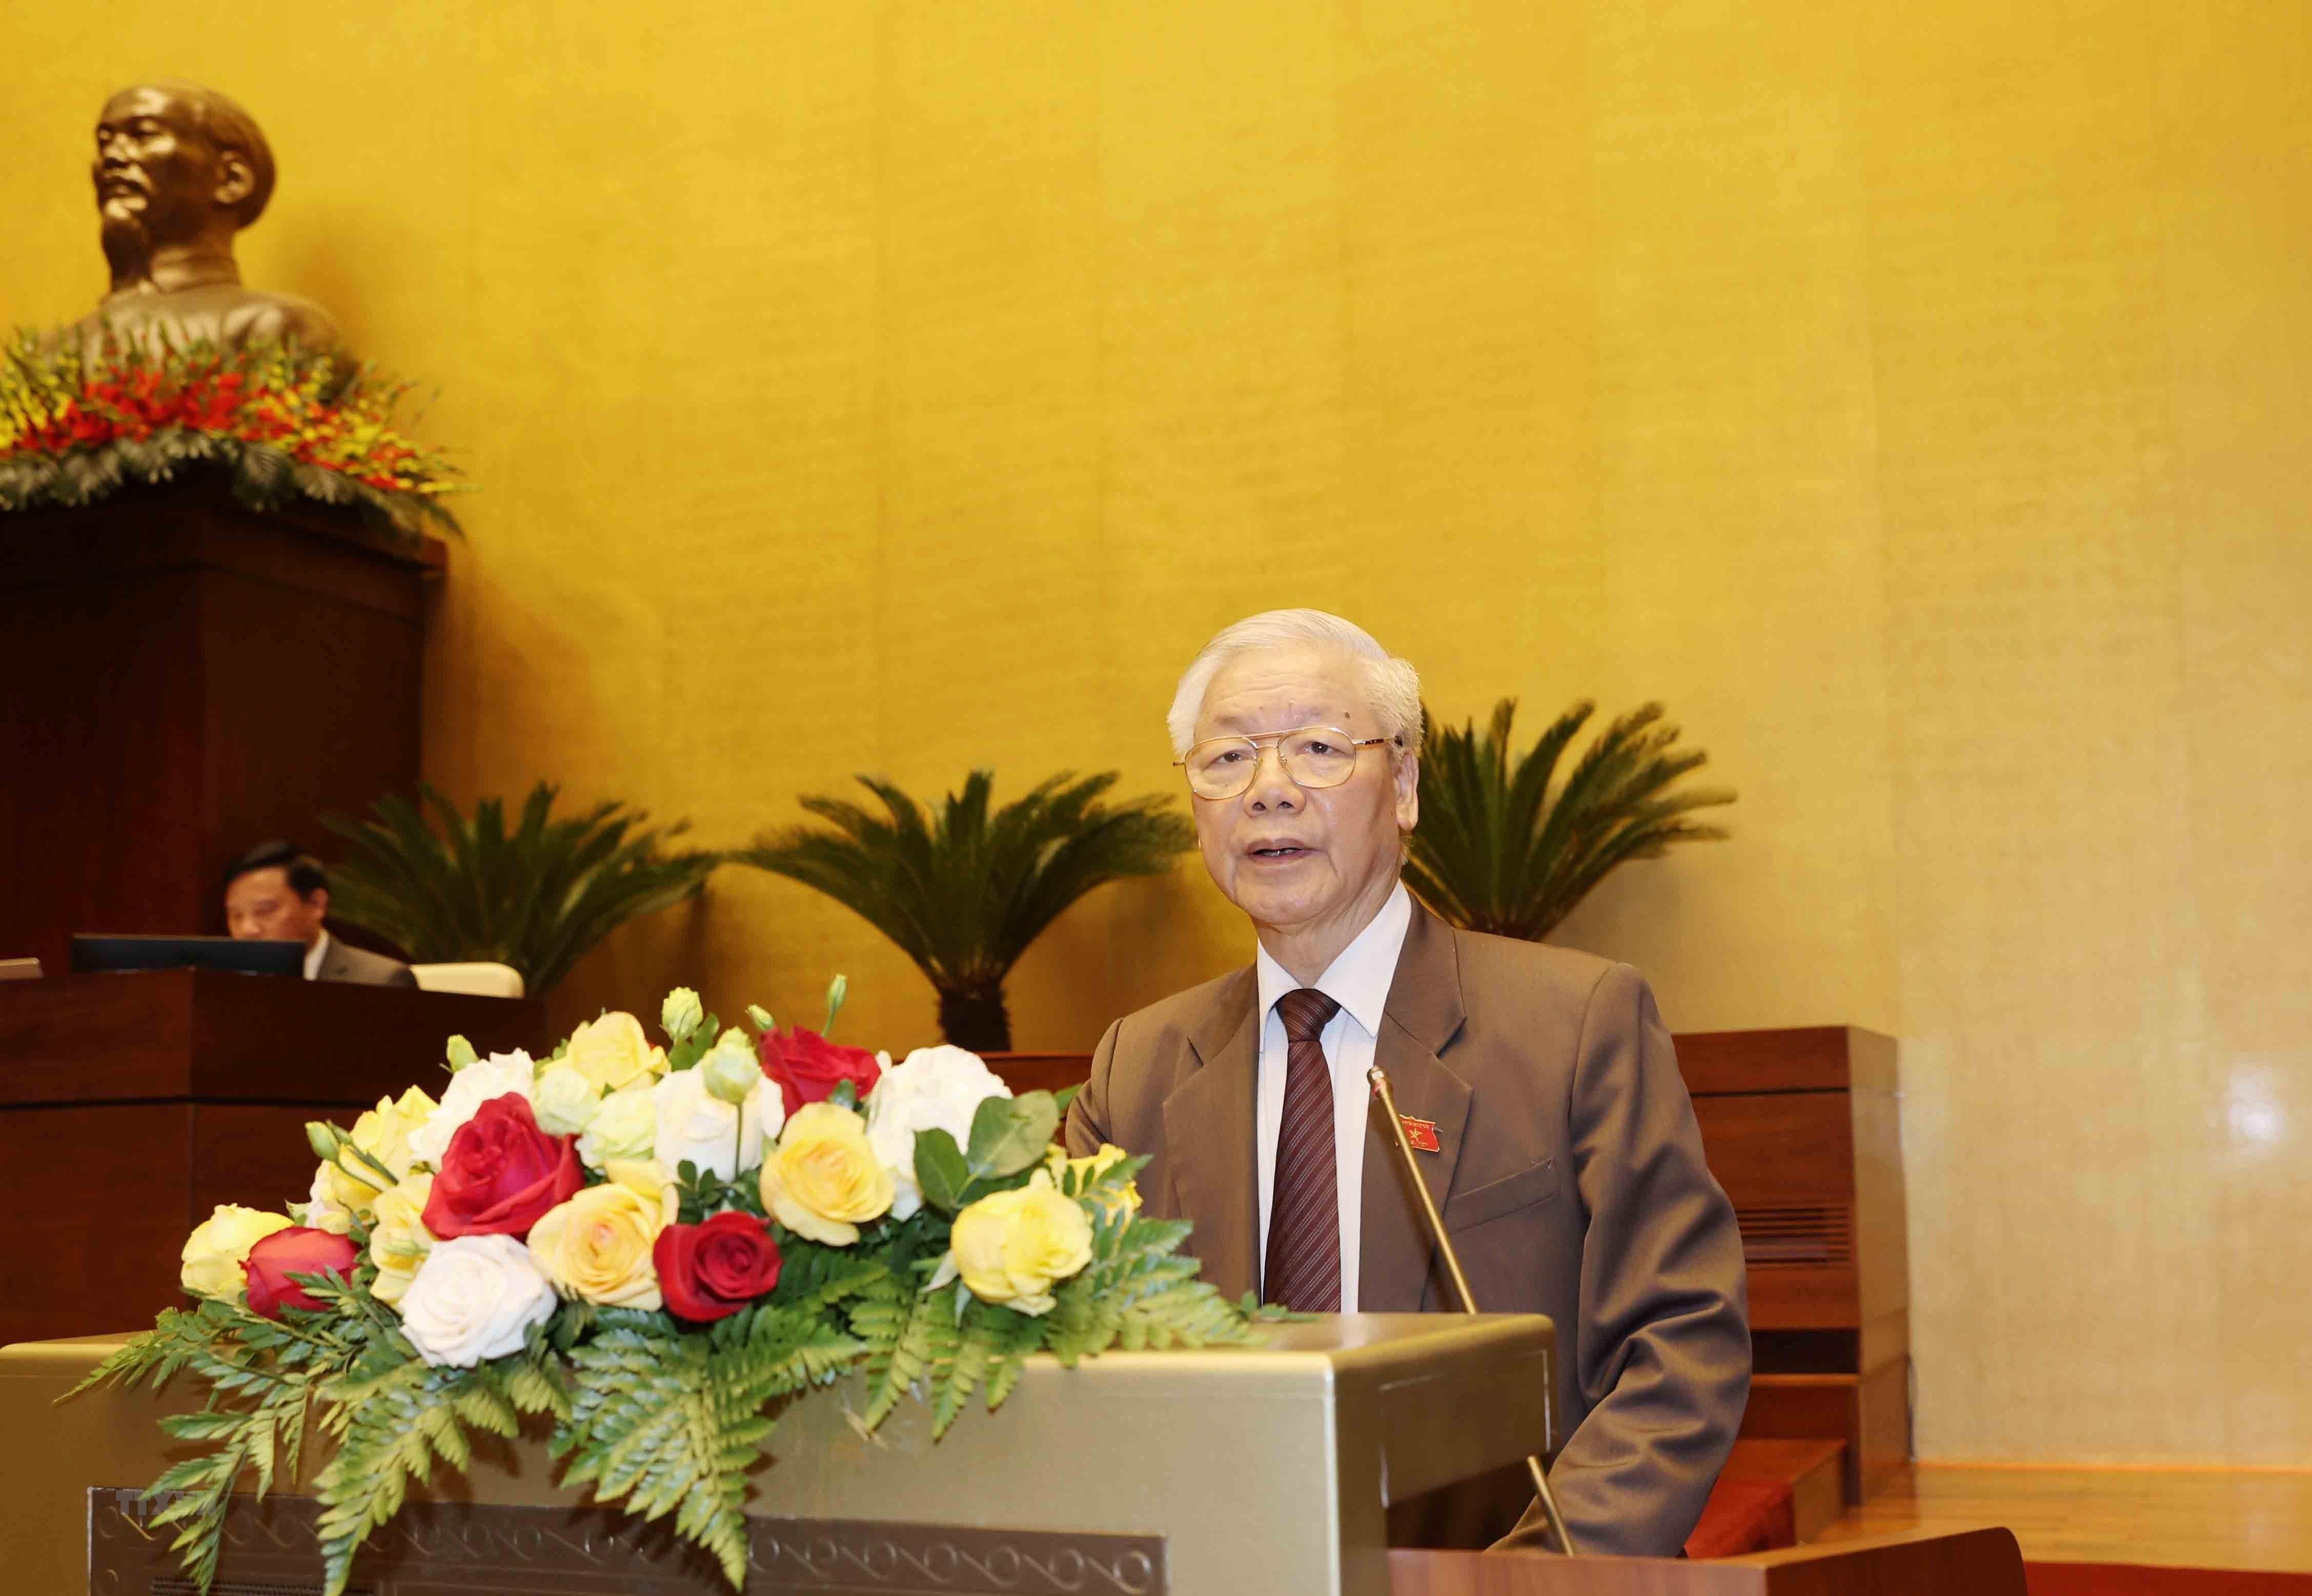 Chu tich nuoc Nguyen Phu Trong trinh Quoc hoi mien nhiem Thu tuong hinh anh 3